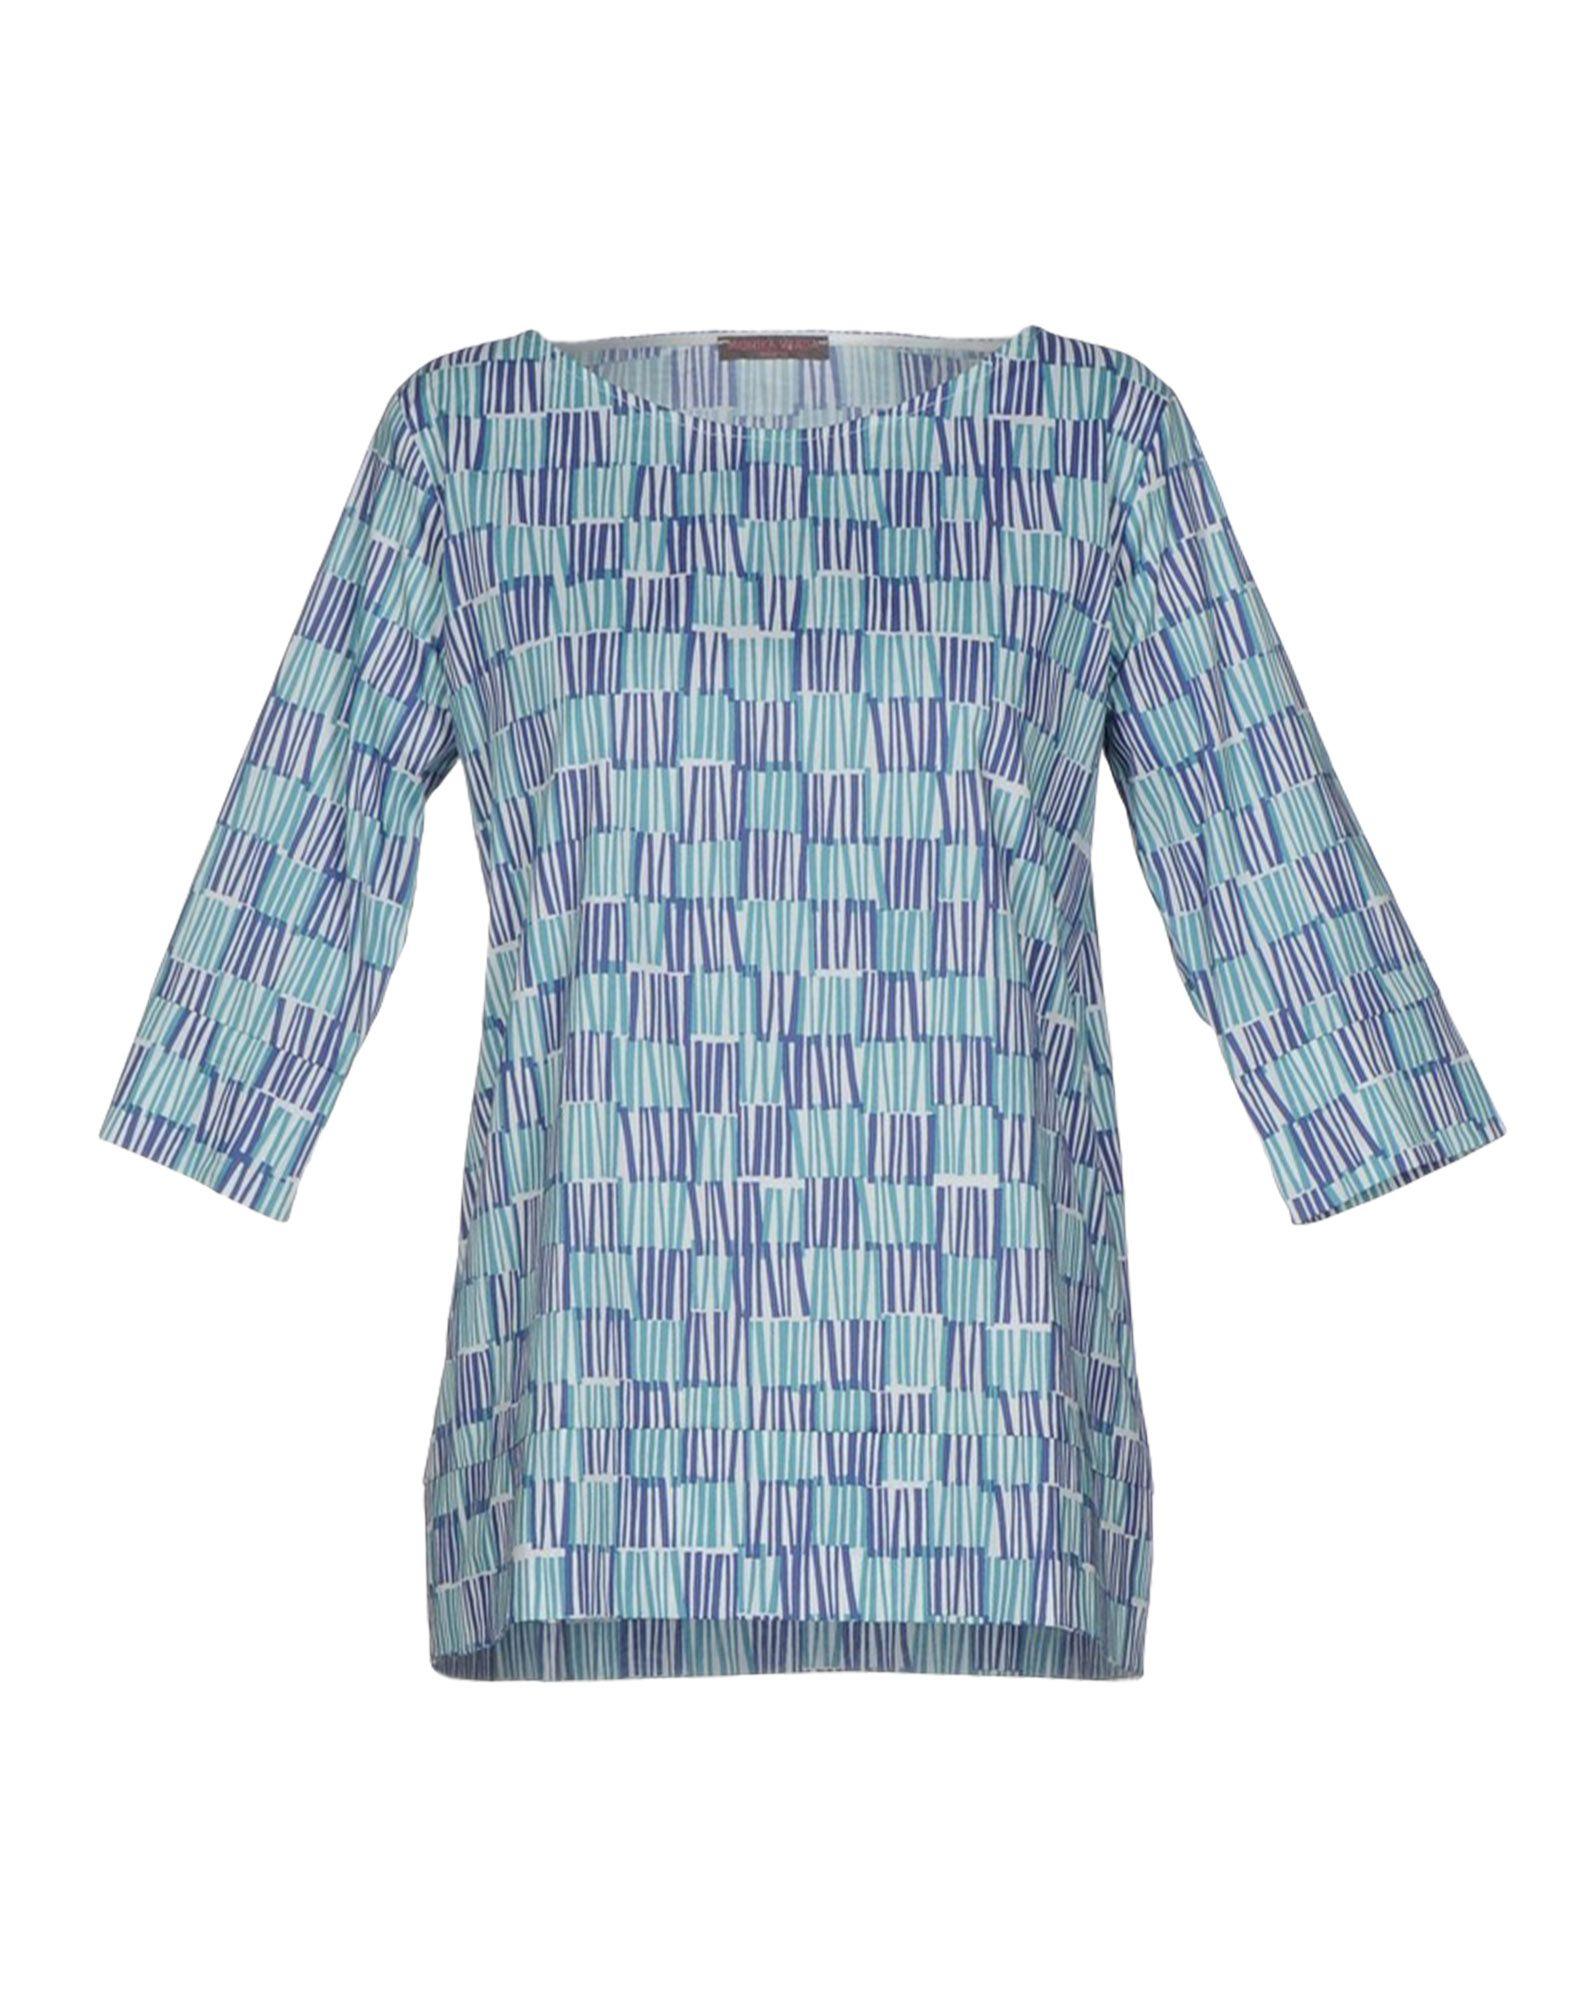 MONIKA VARGA Блузка monika varga блузка